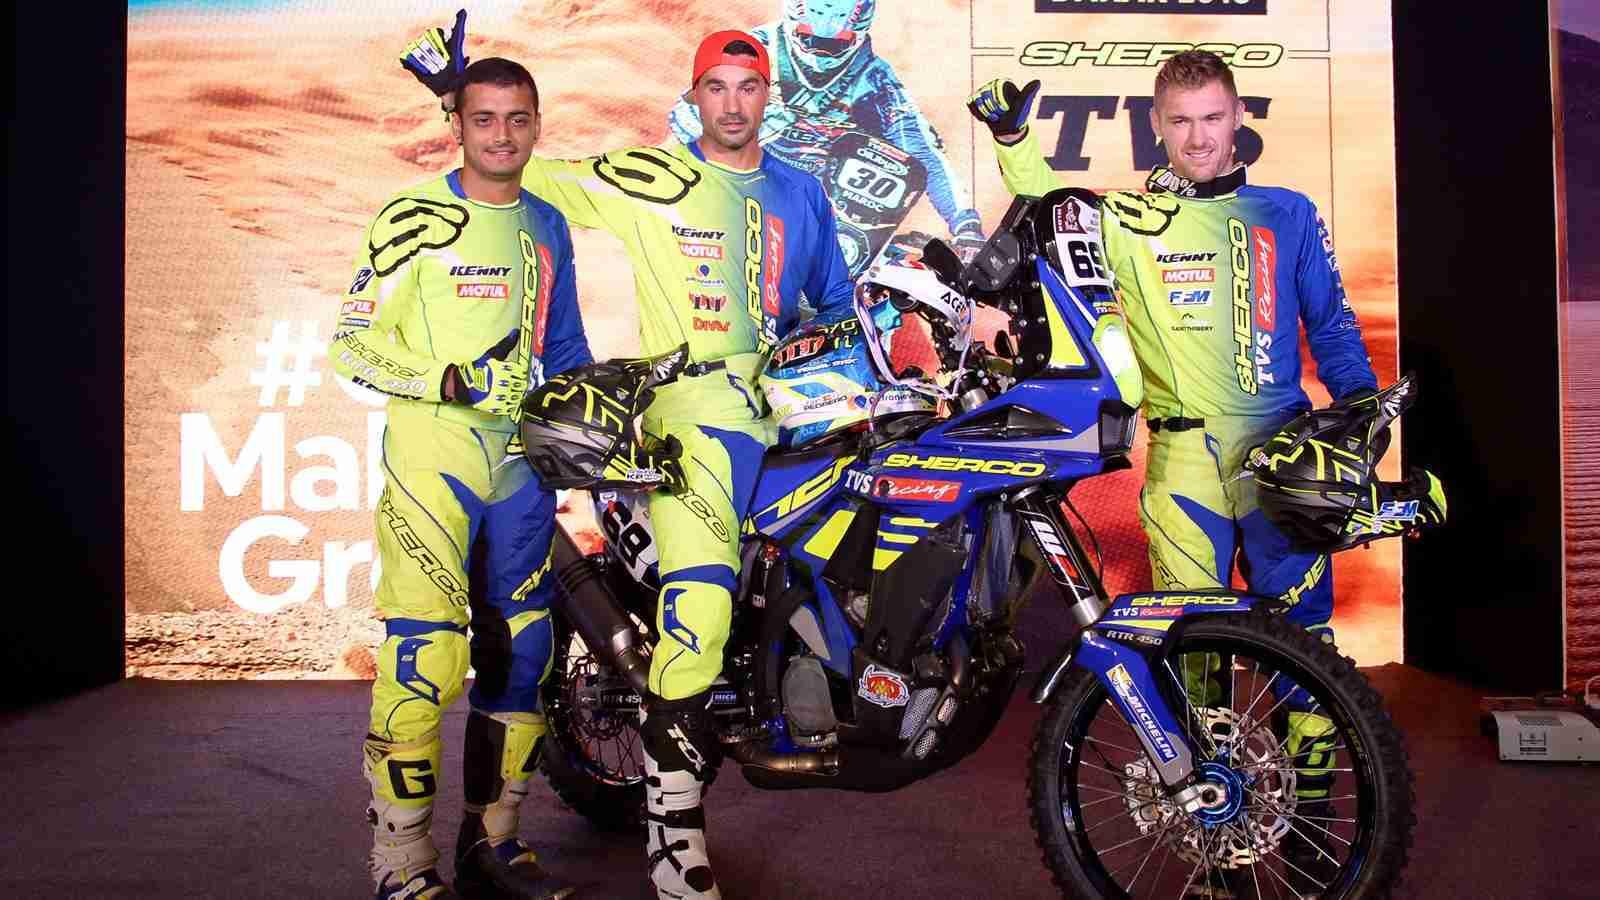 Sherco TVS Factory Rally Team ready for Dakar 2018 - Aravind KP, Joan Pedrero and Adrien Metge